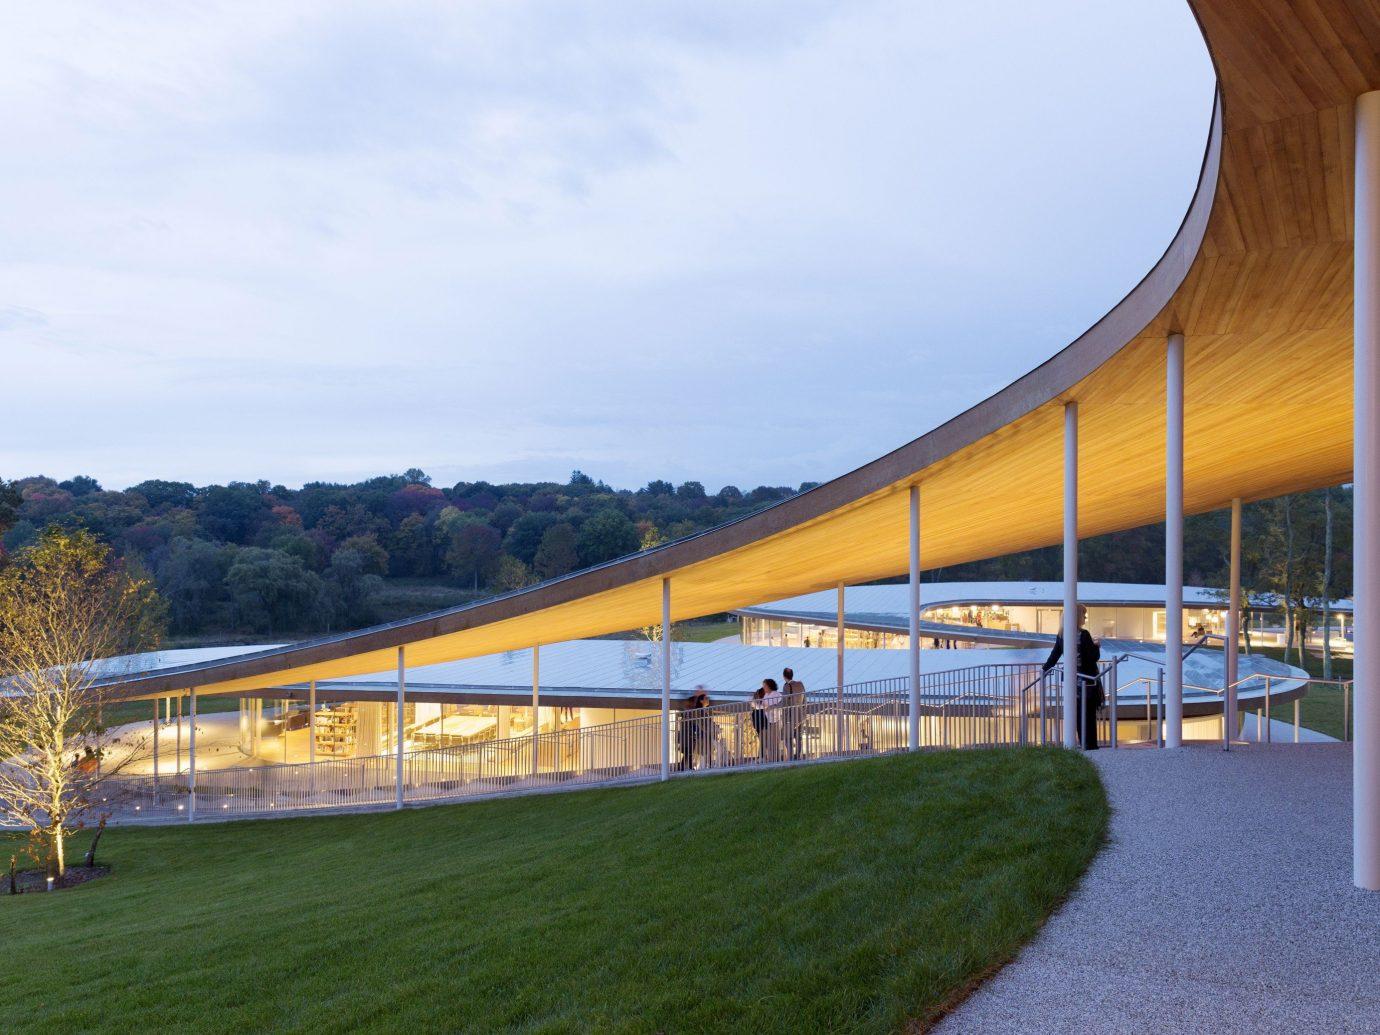 Trip Ideas grass sky outdoor structure bridge building Architecture sport venue overpass stadium arch